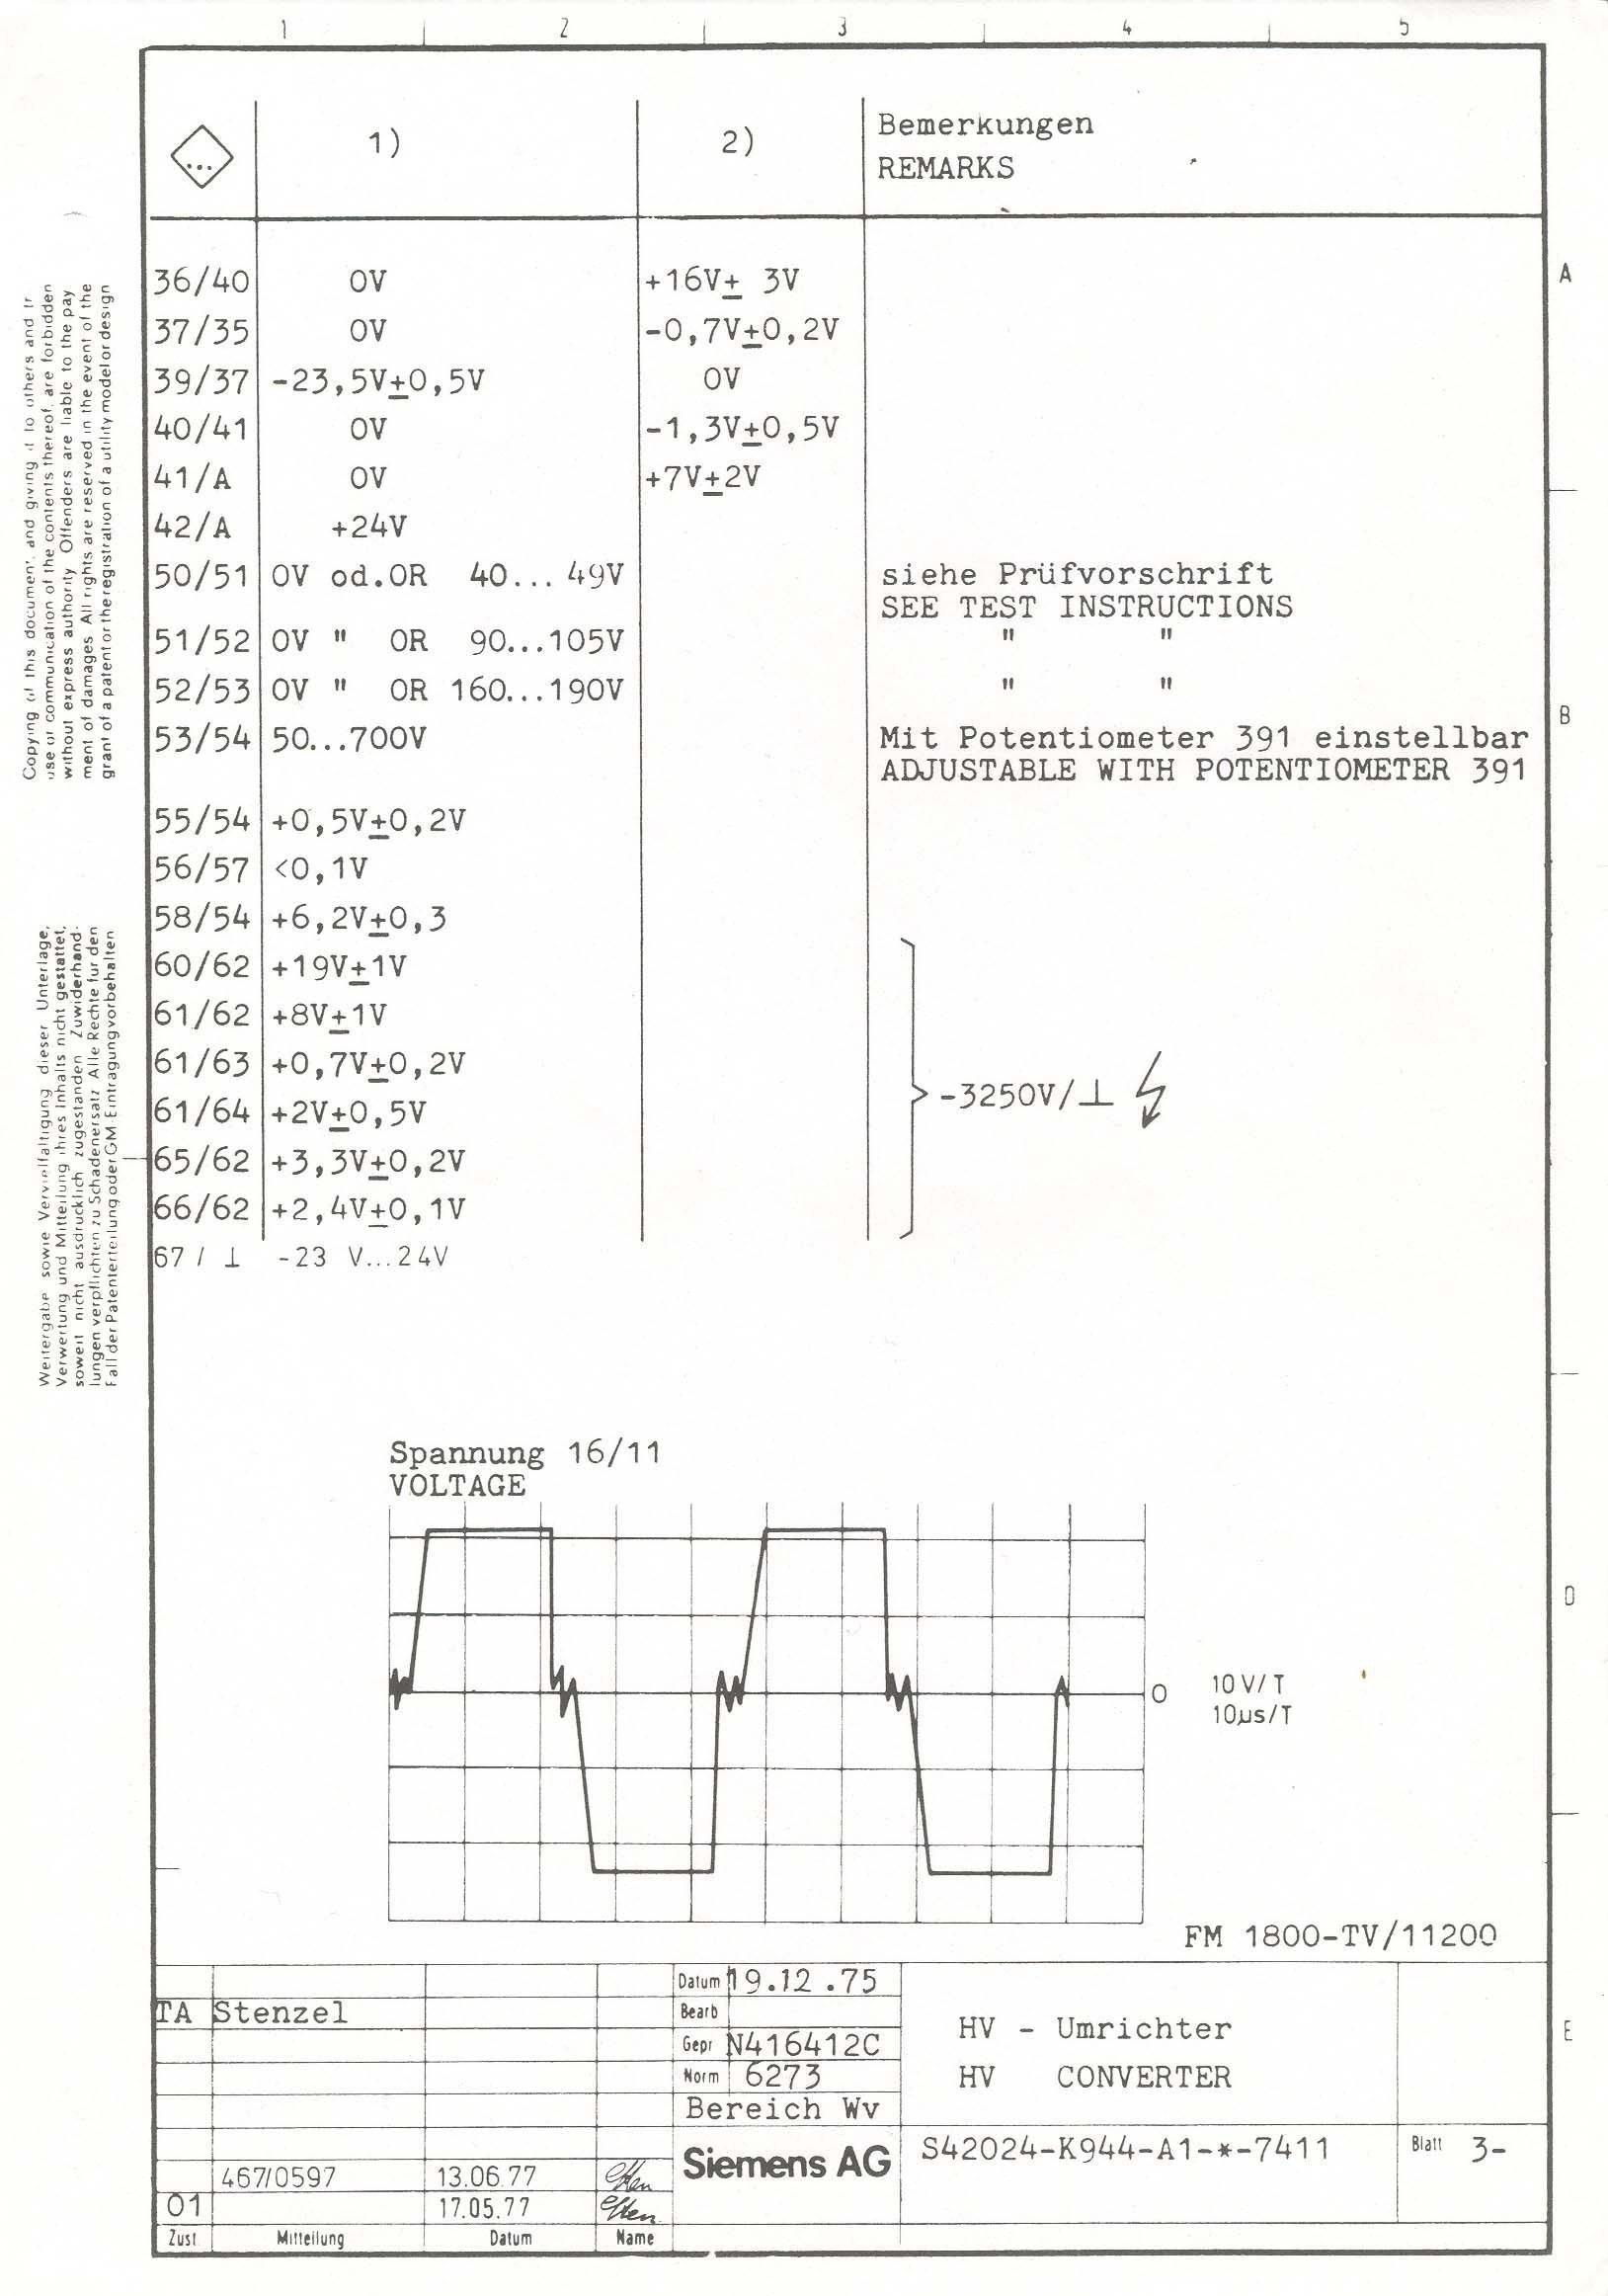 7 3 L Powerstroke Engine Diagram Reference 7 3 Powerstroke Glow Plug Relay Wiring Diagram Of 7 3 L Powerstroke Engine Diagram